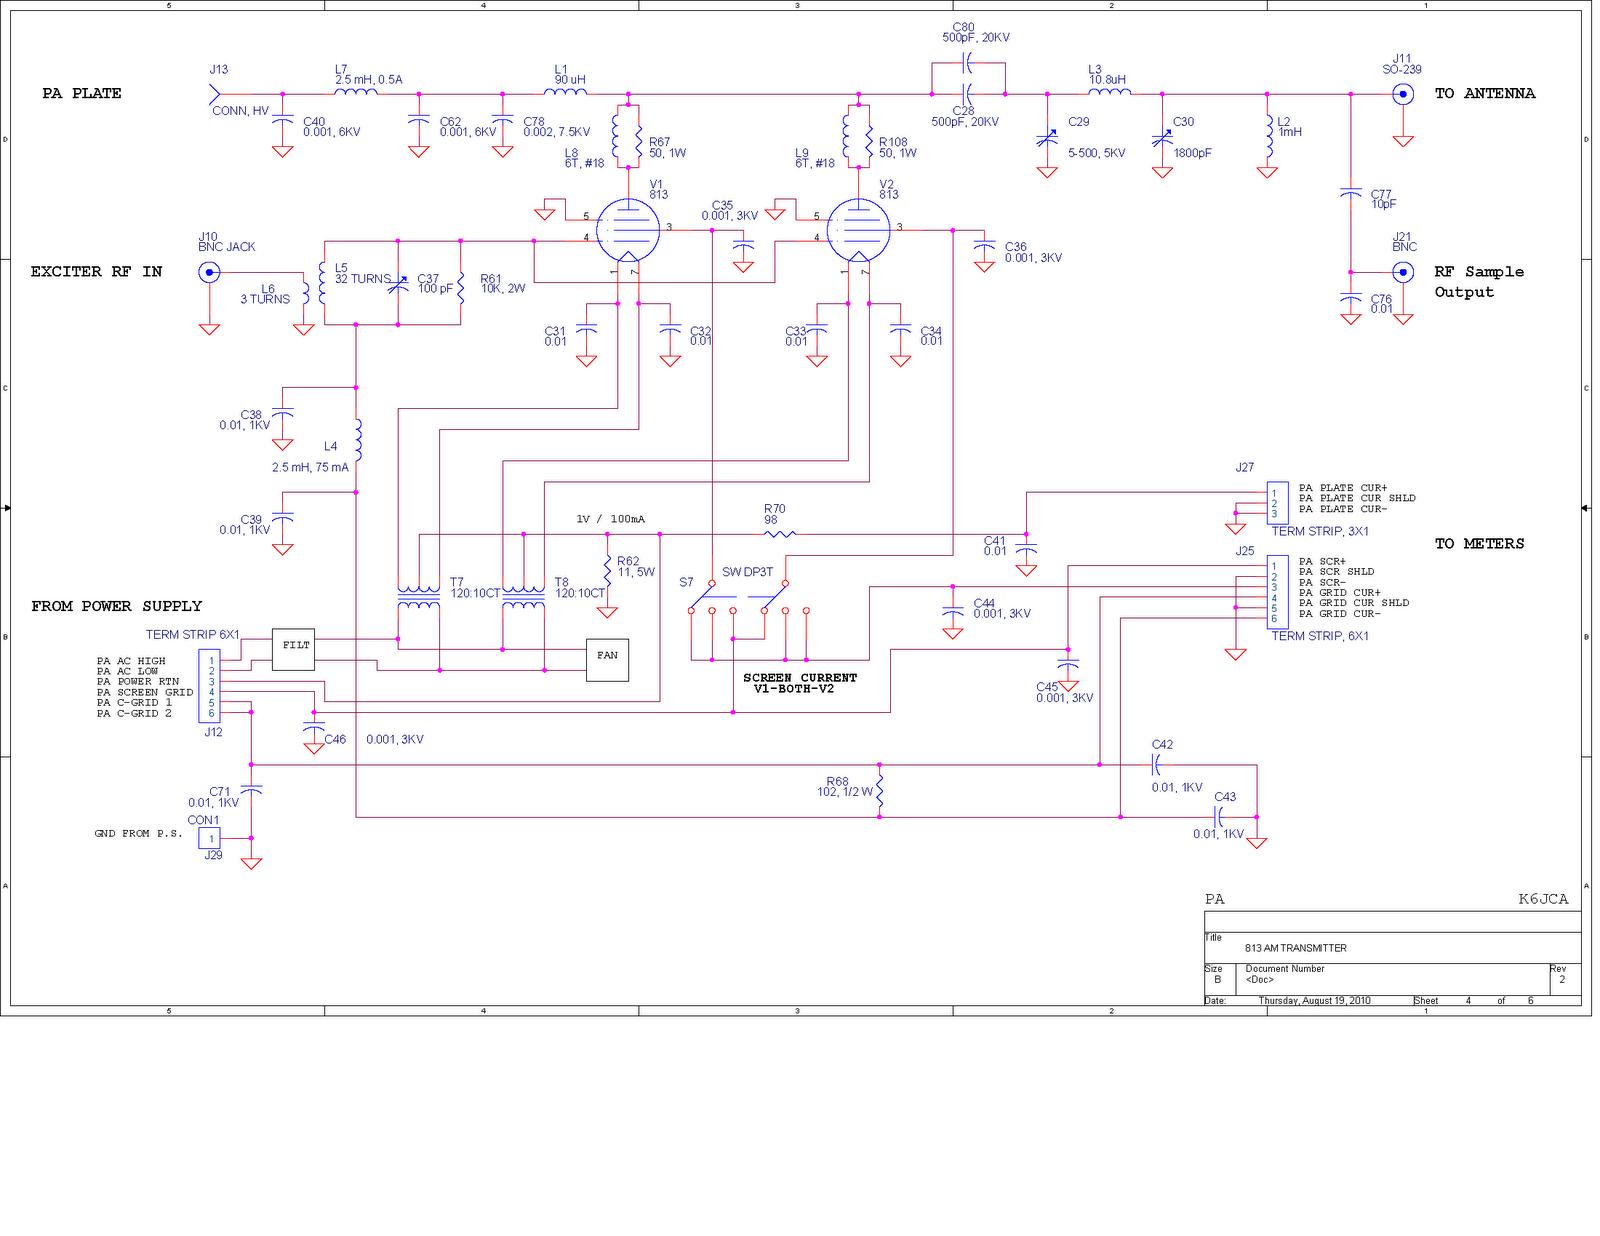 rf modulator hookup diagram club car precedent 4 battery wiring k6jca am transmitter 813 style part 1 pa deck